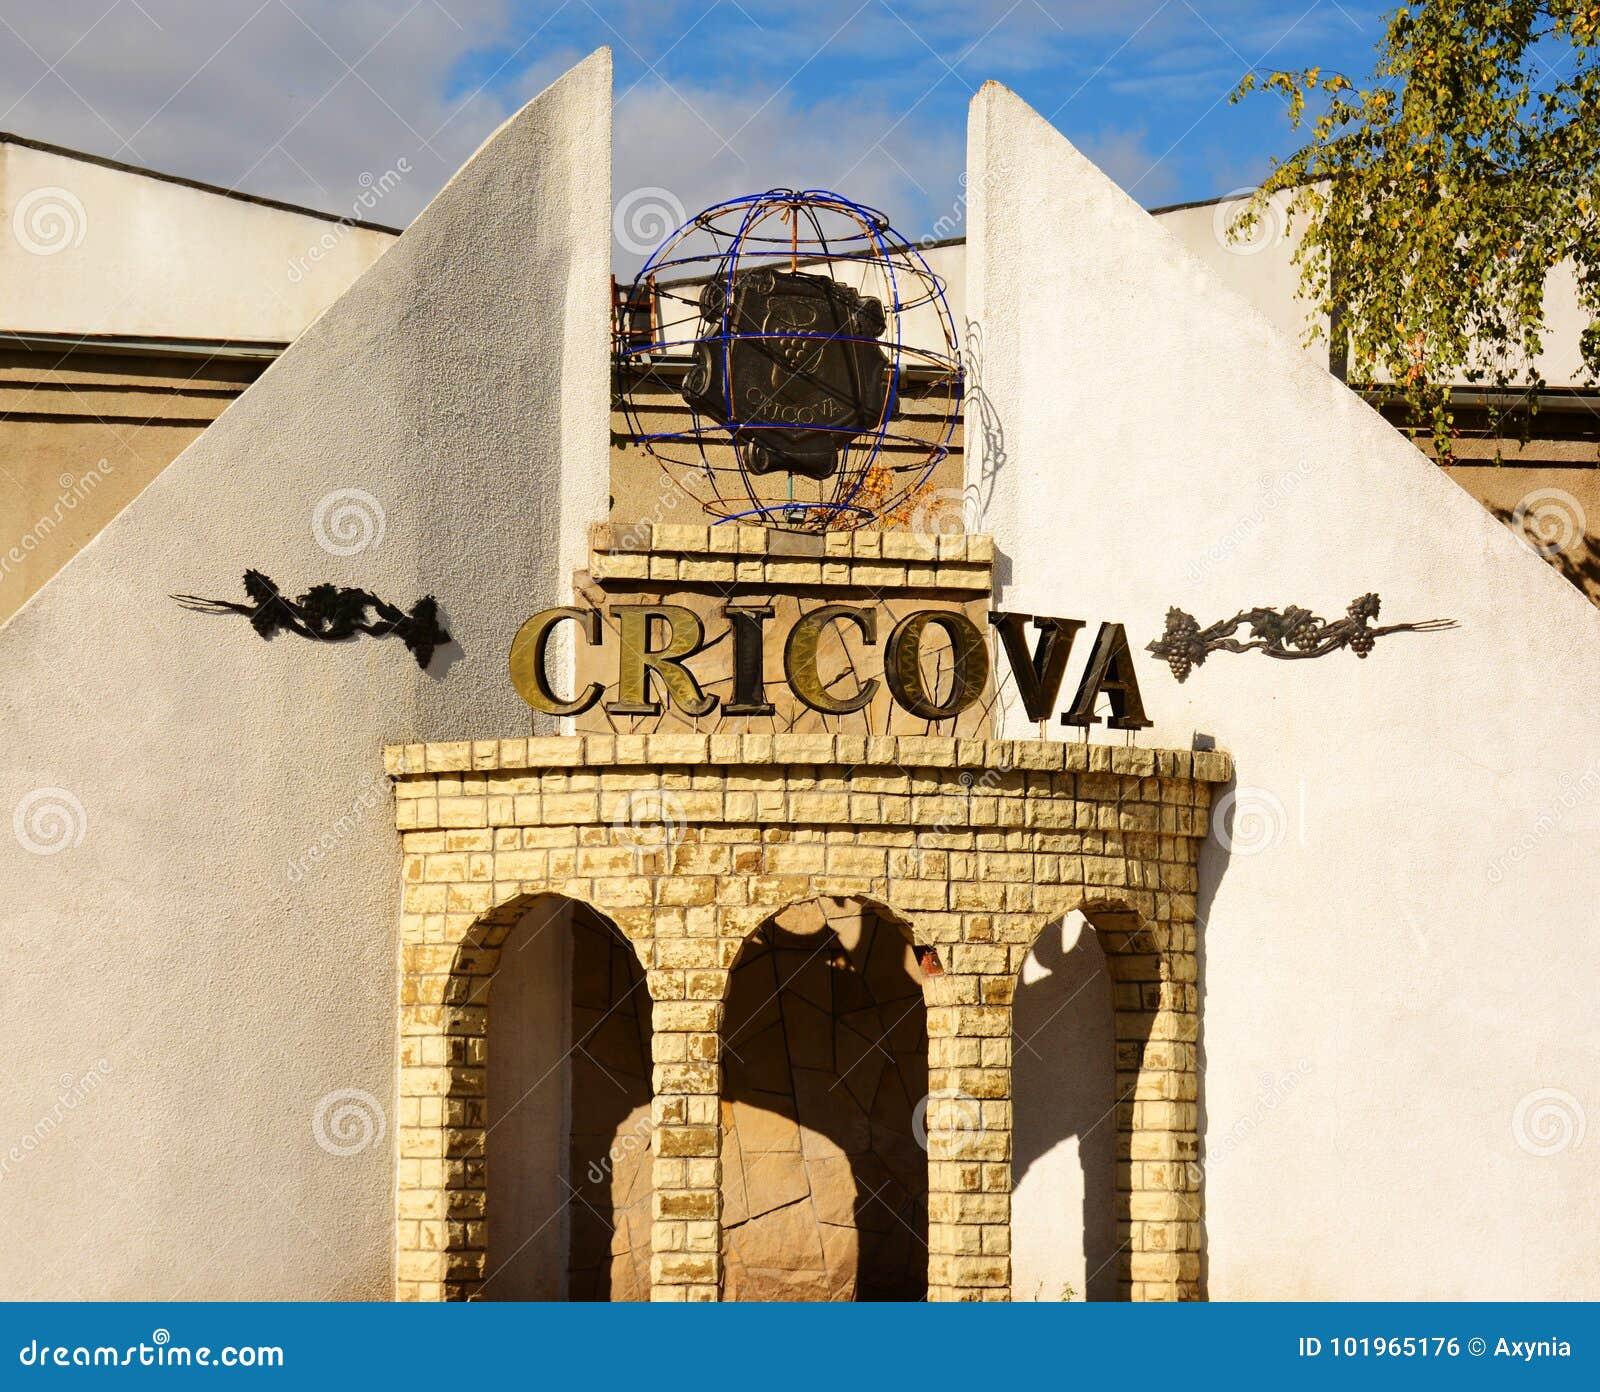 Vinery de Cricova, Moldova, opinião da fachada da fábrica